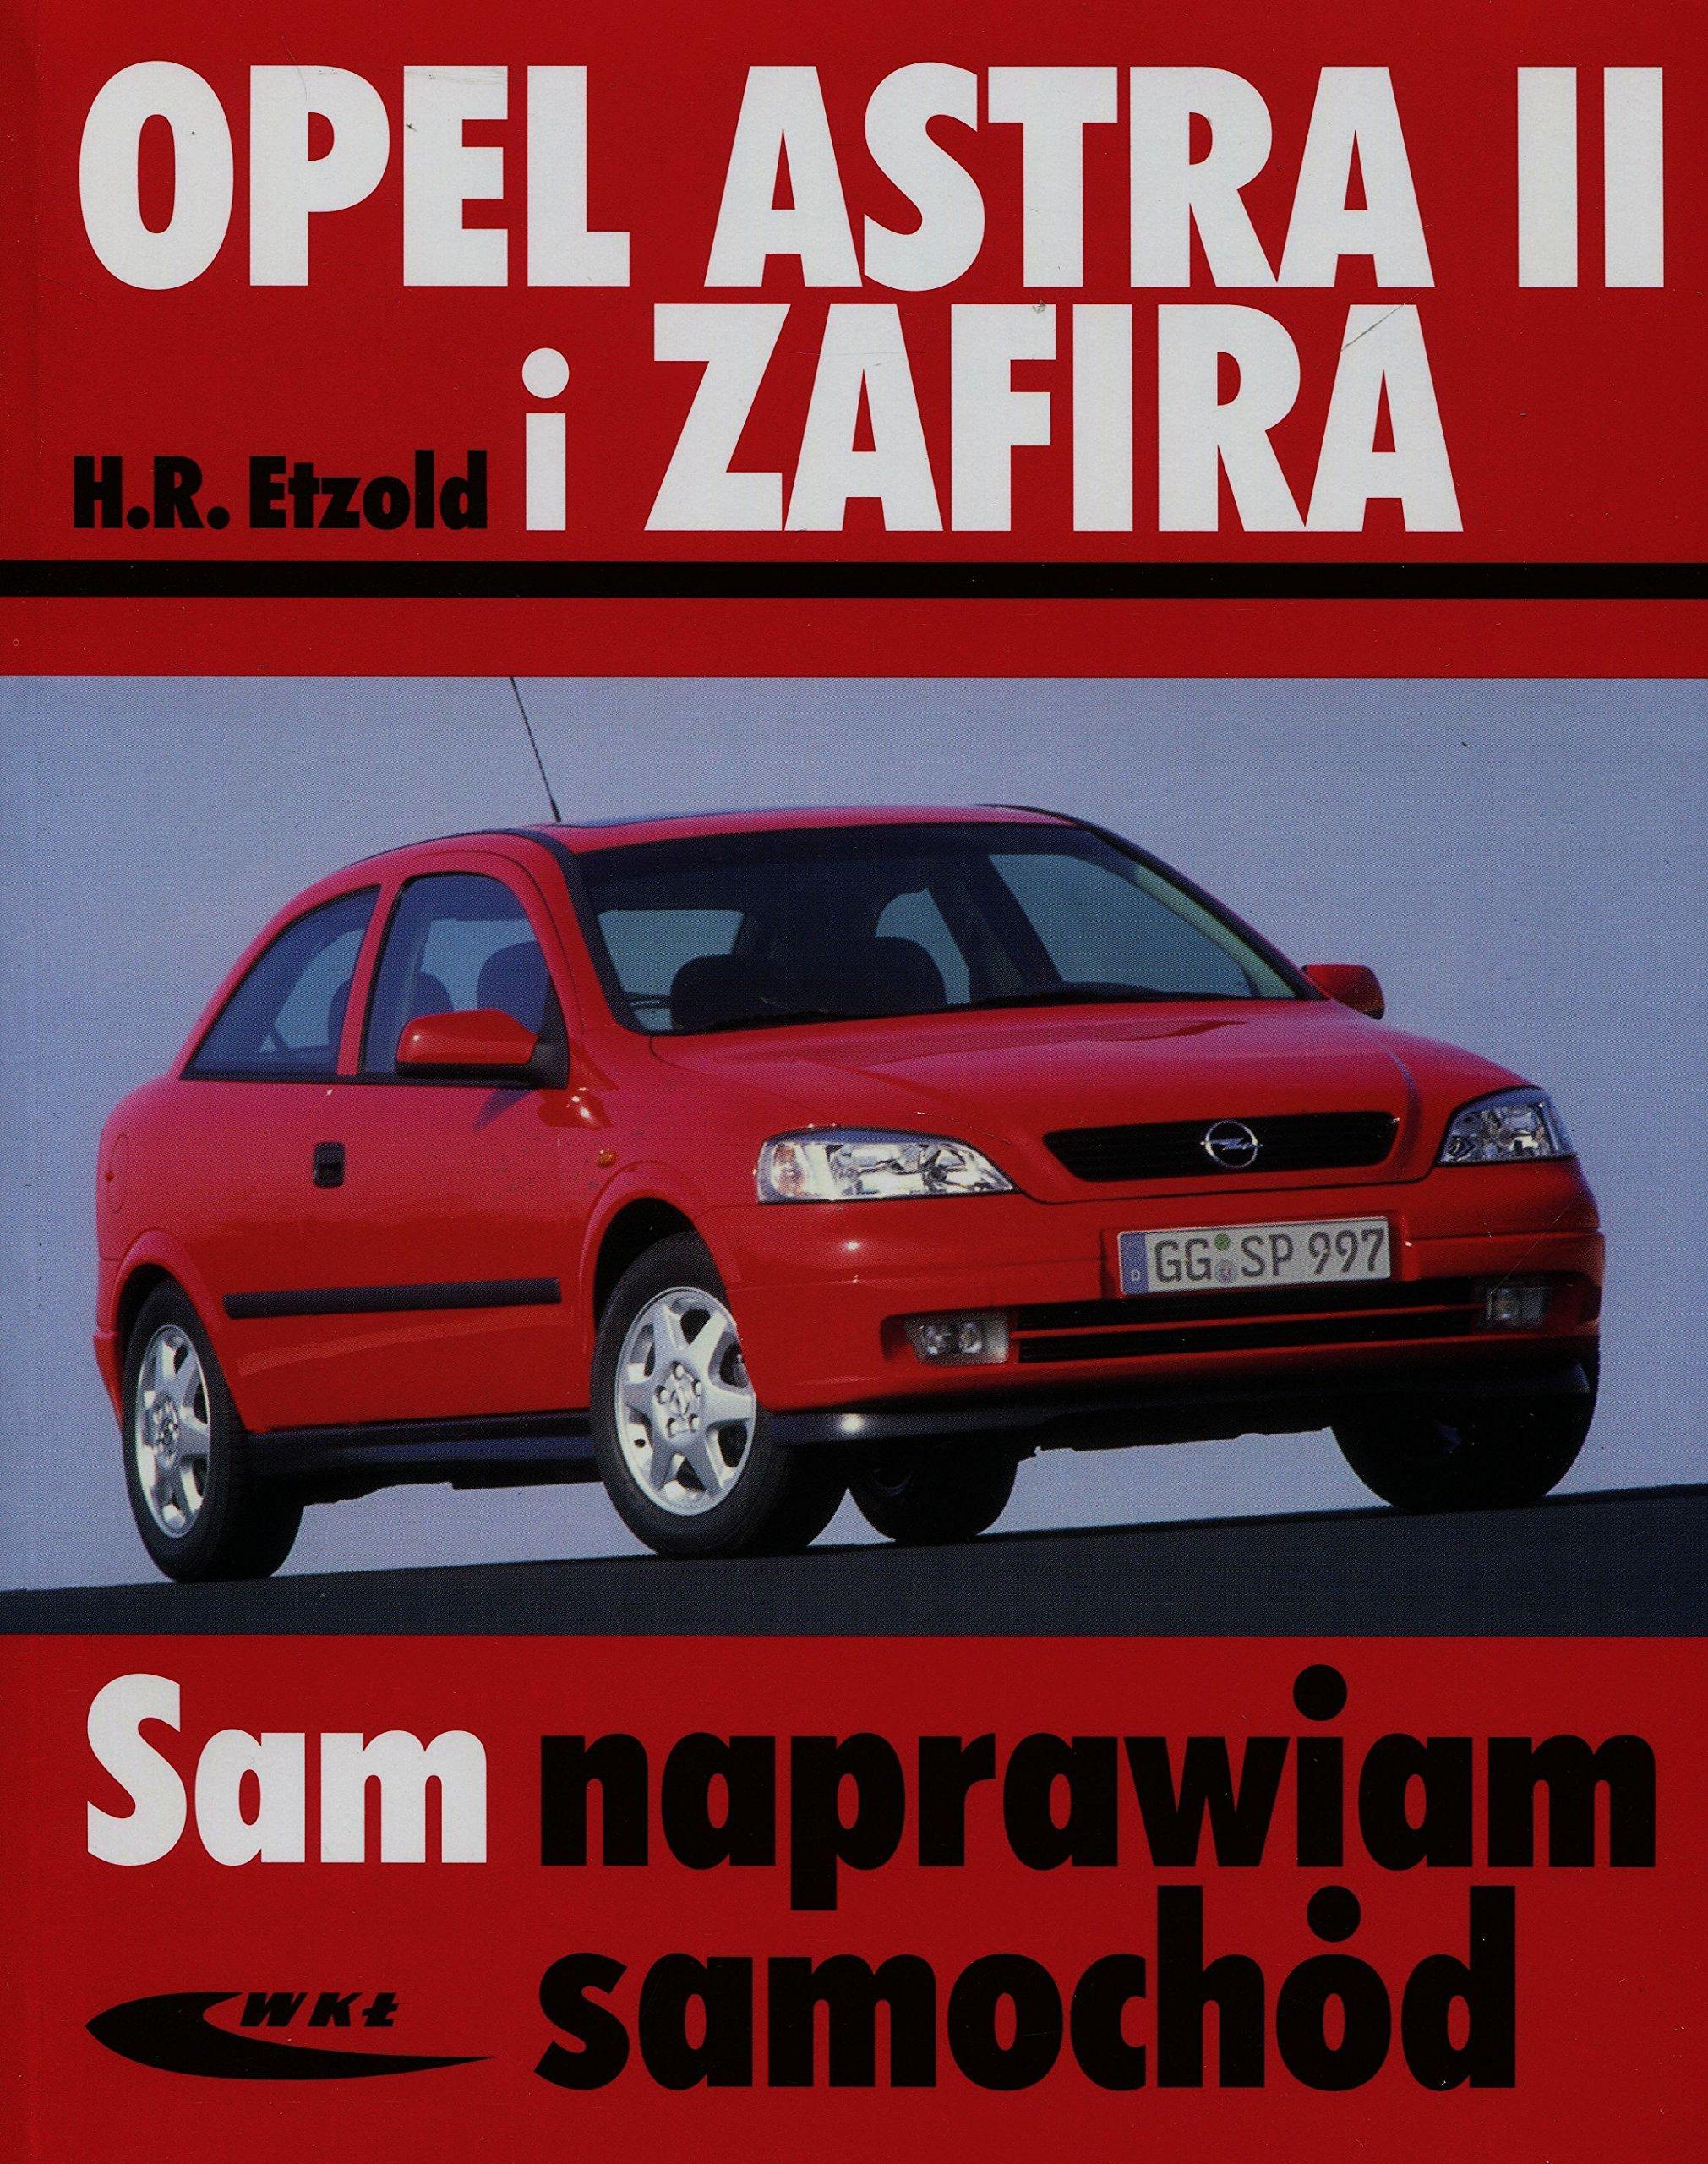 Opel Astra II i Zafira: Amazon.es: H. R. Etzold: Libros en idiomas extranjeros